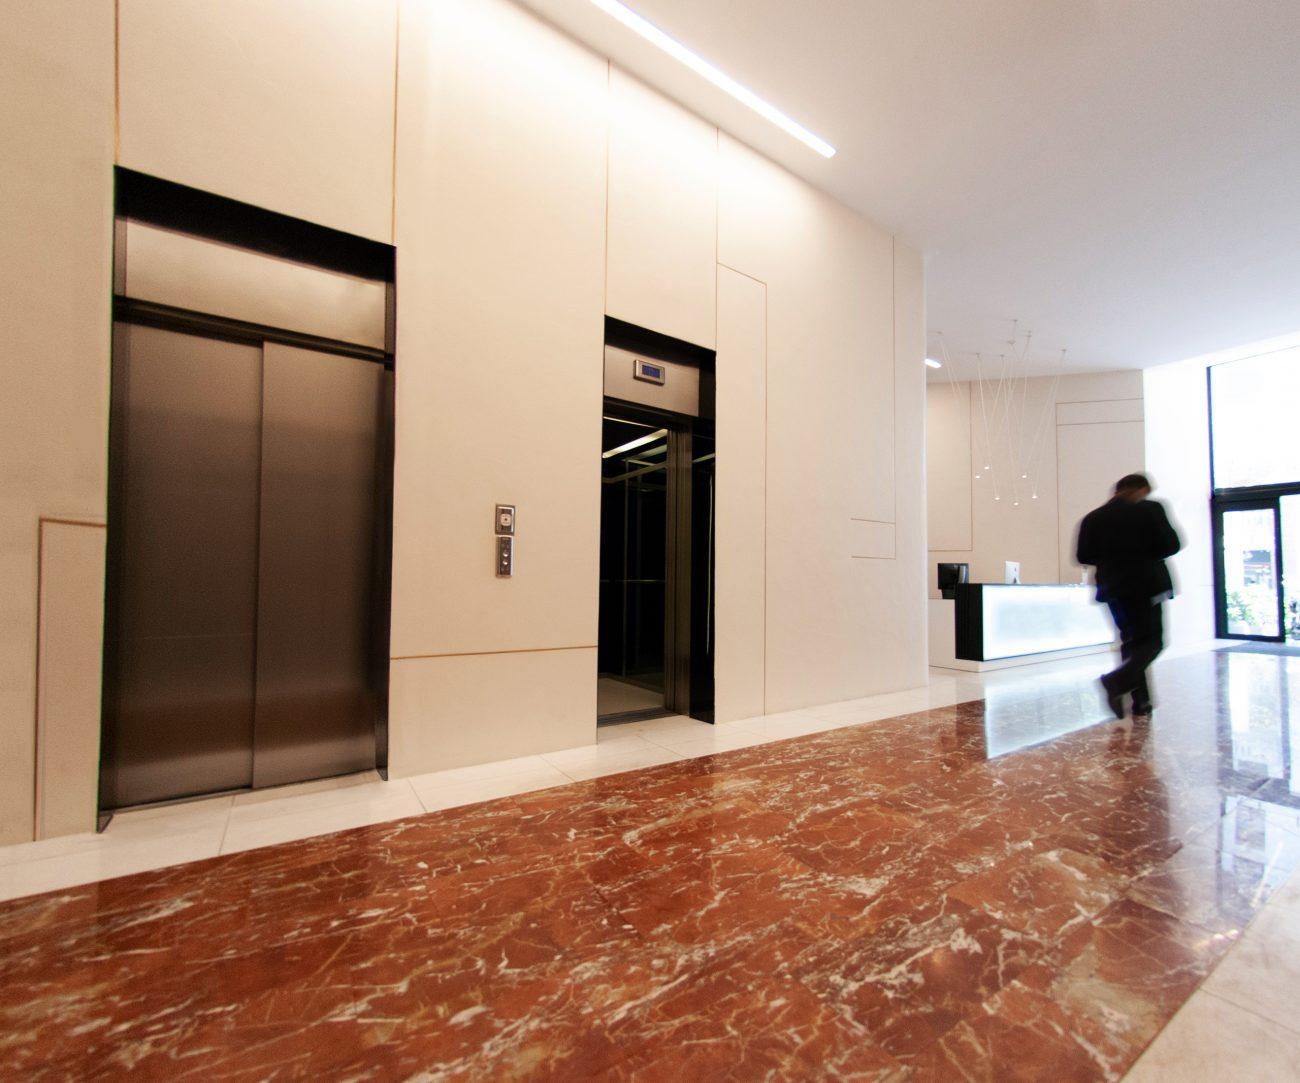 arquitectura_corporativa_diseno_interiores_oficinas_recepcion_mostrador_led_lampara_vibia